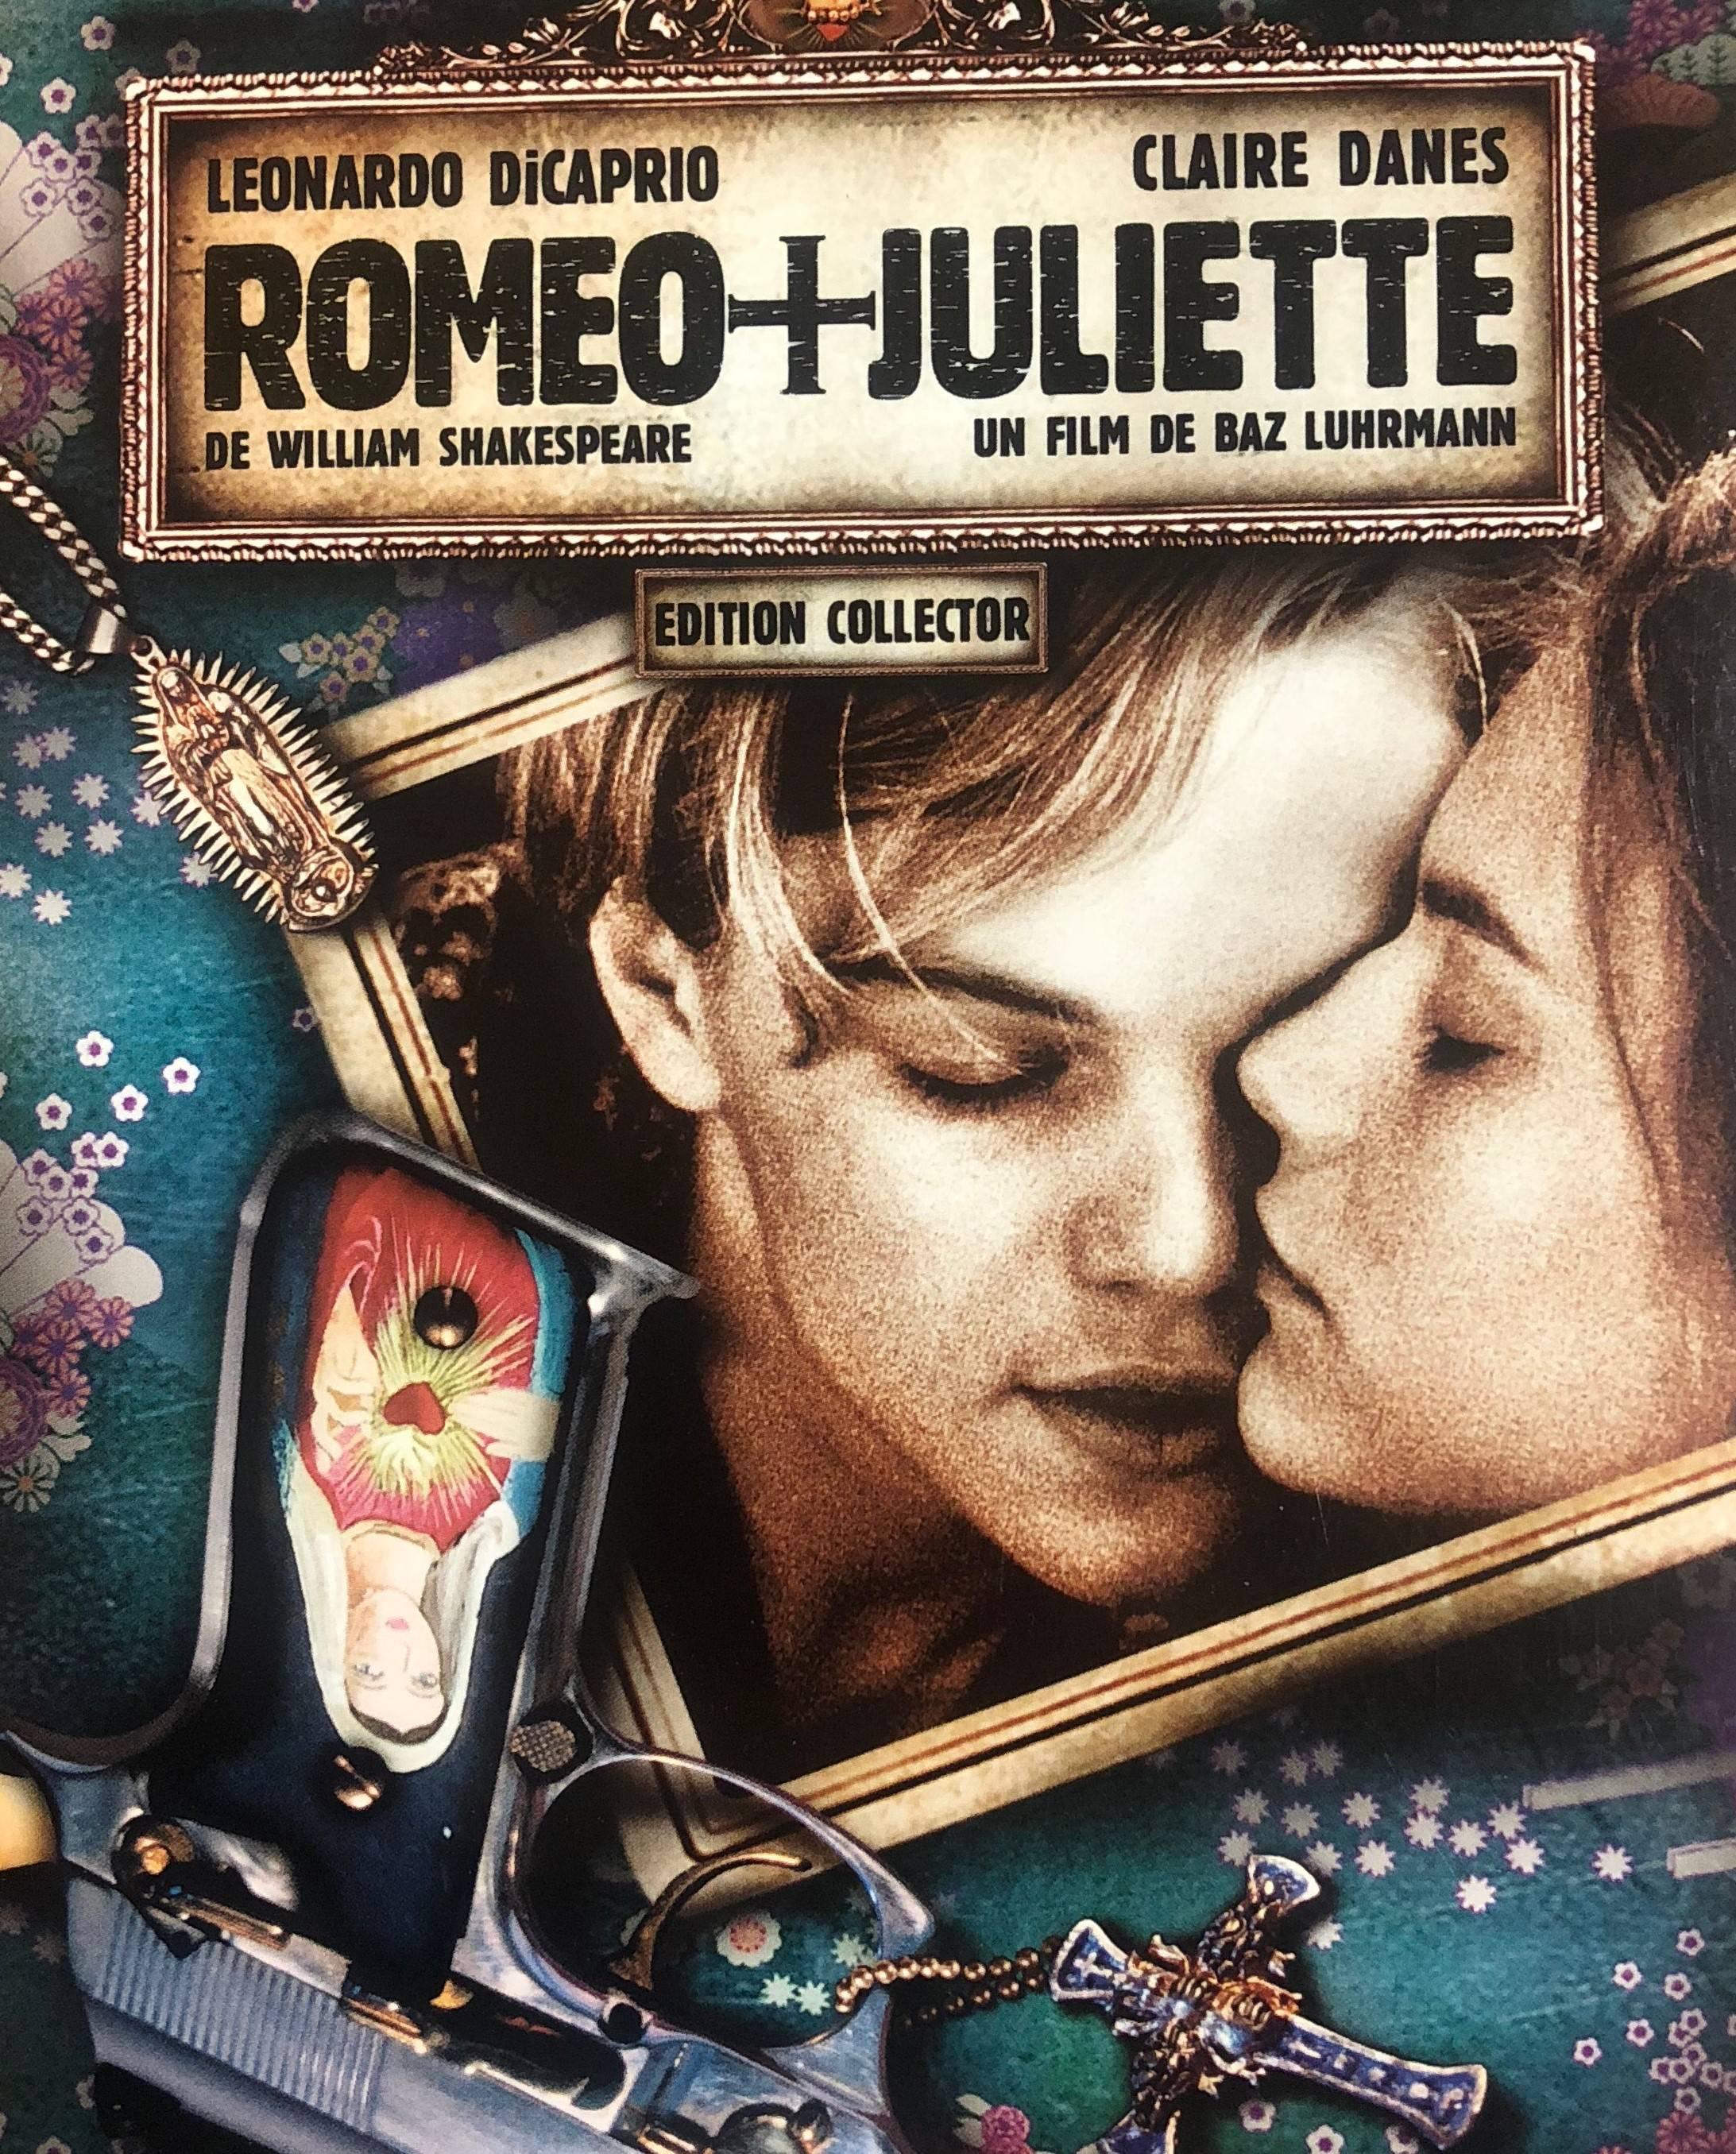 ROMEO + JULIETTE - Romeo + Juliette - Others